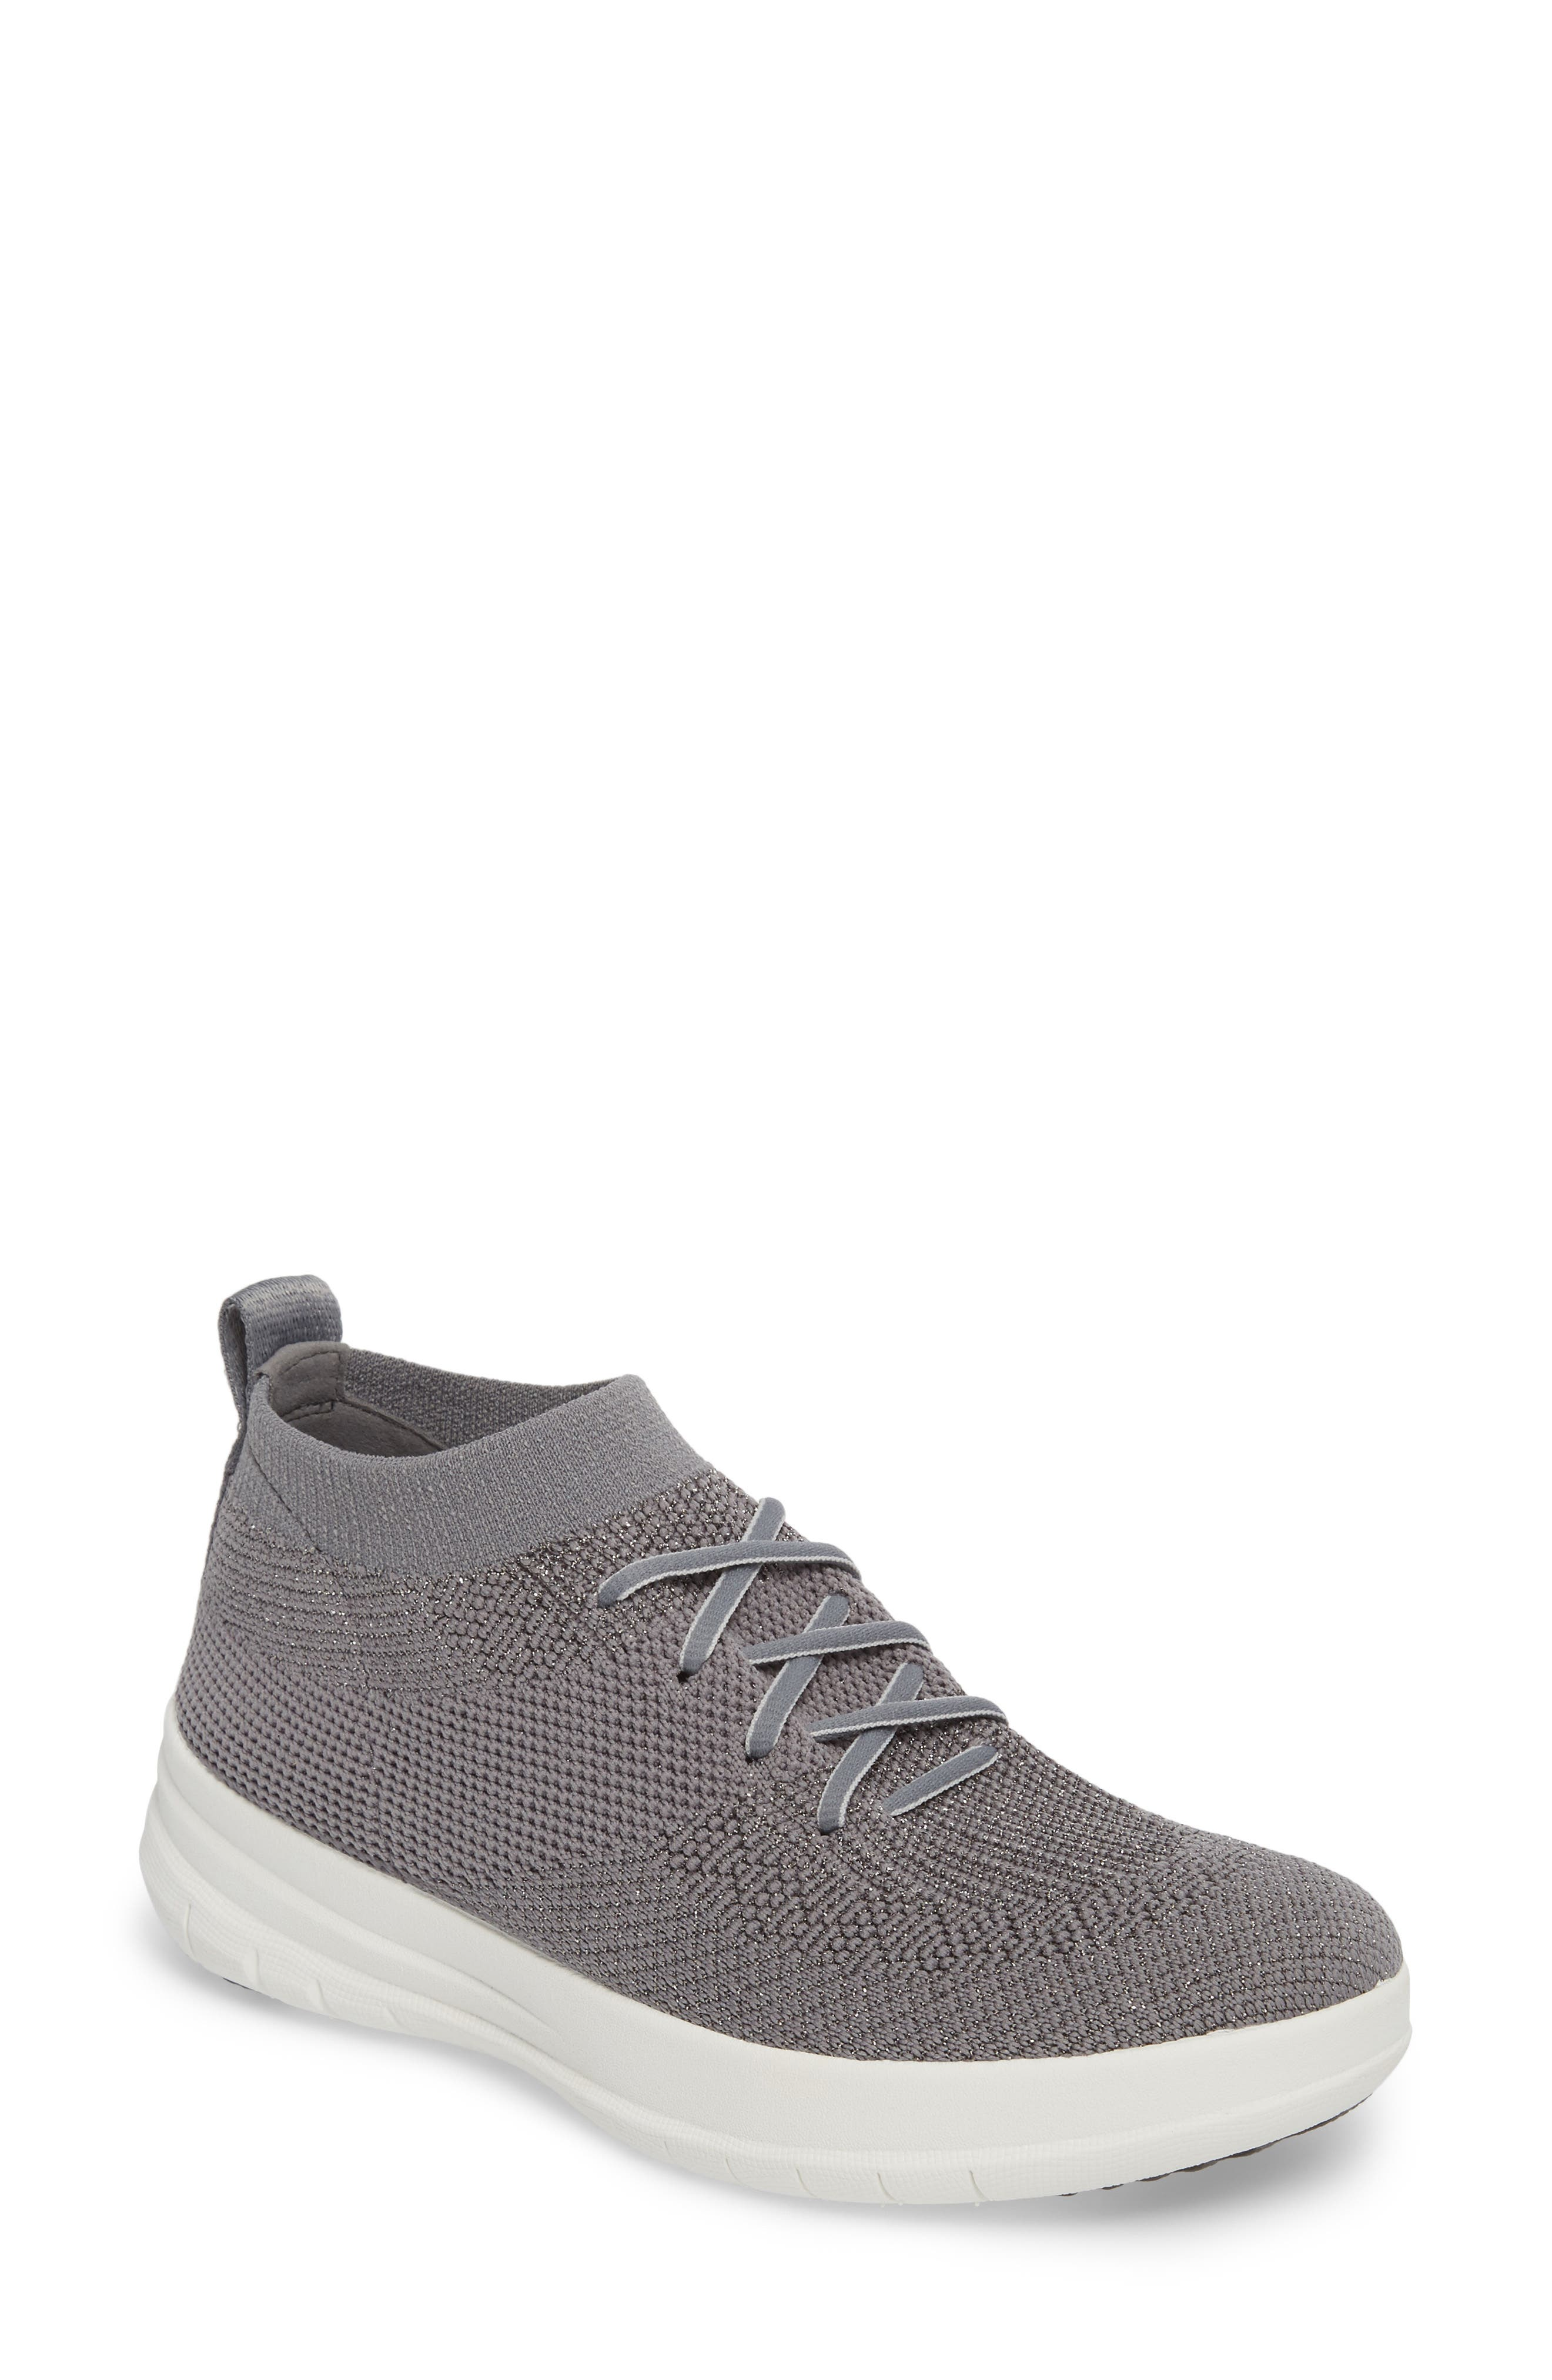 Uberknit<sup>™</sup> Slip-On High-Top Sneaker,                         Main,                         color, Charcoal/ Metallic Pewter